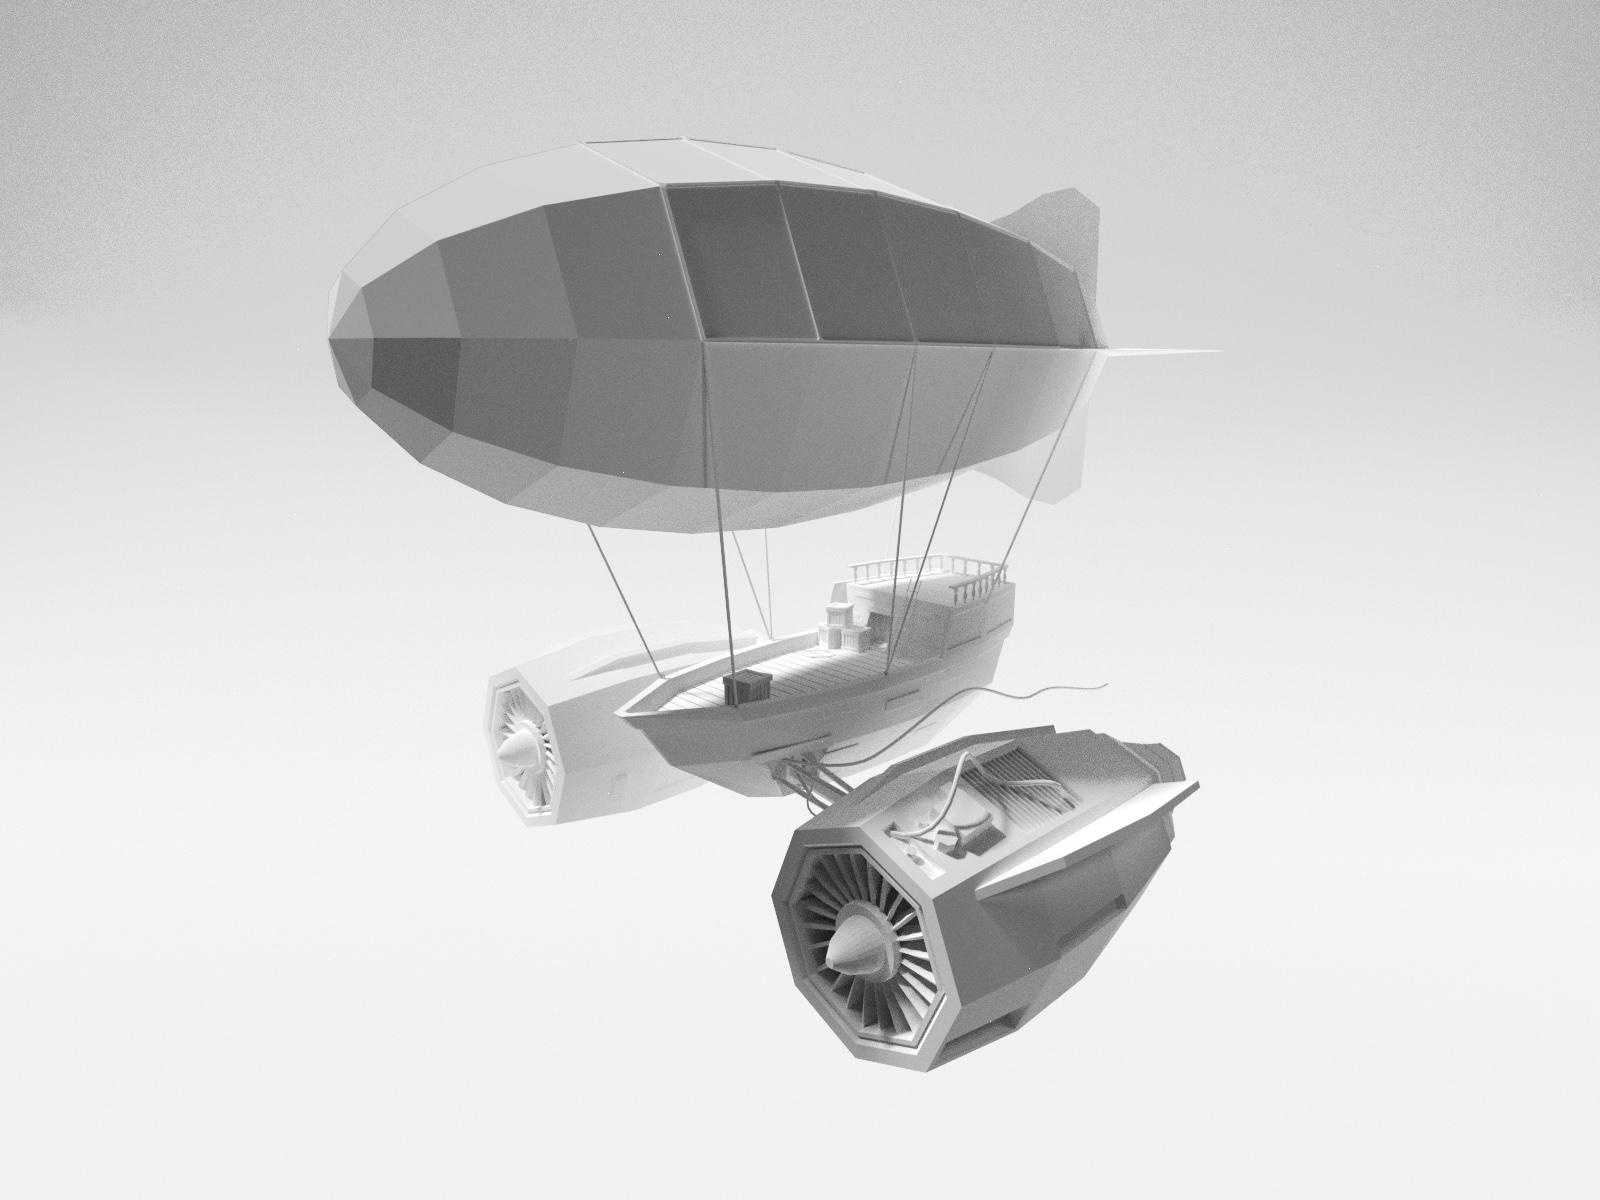 Airship bw2 mist 4x